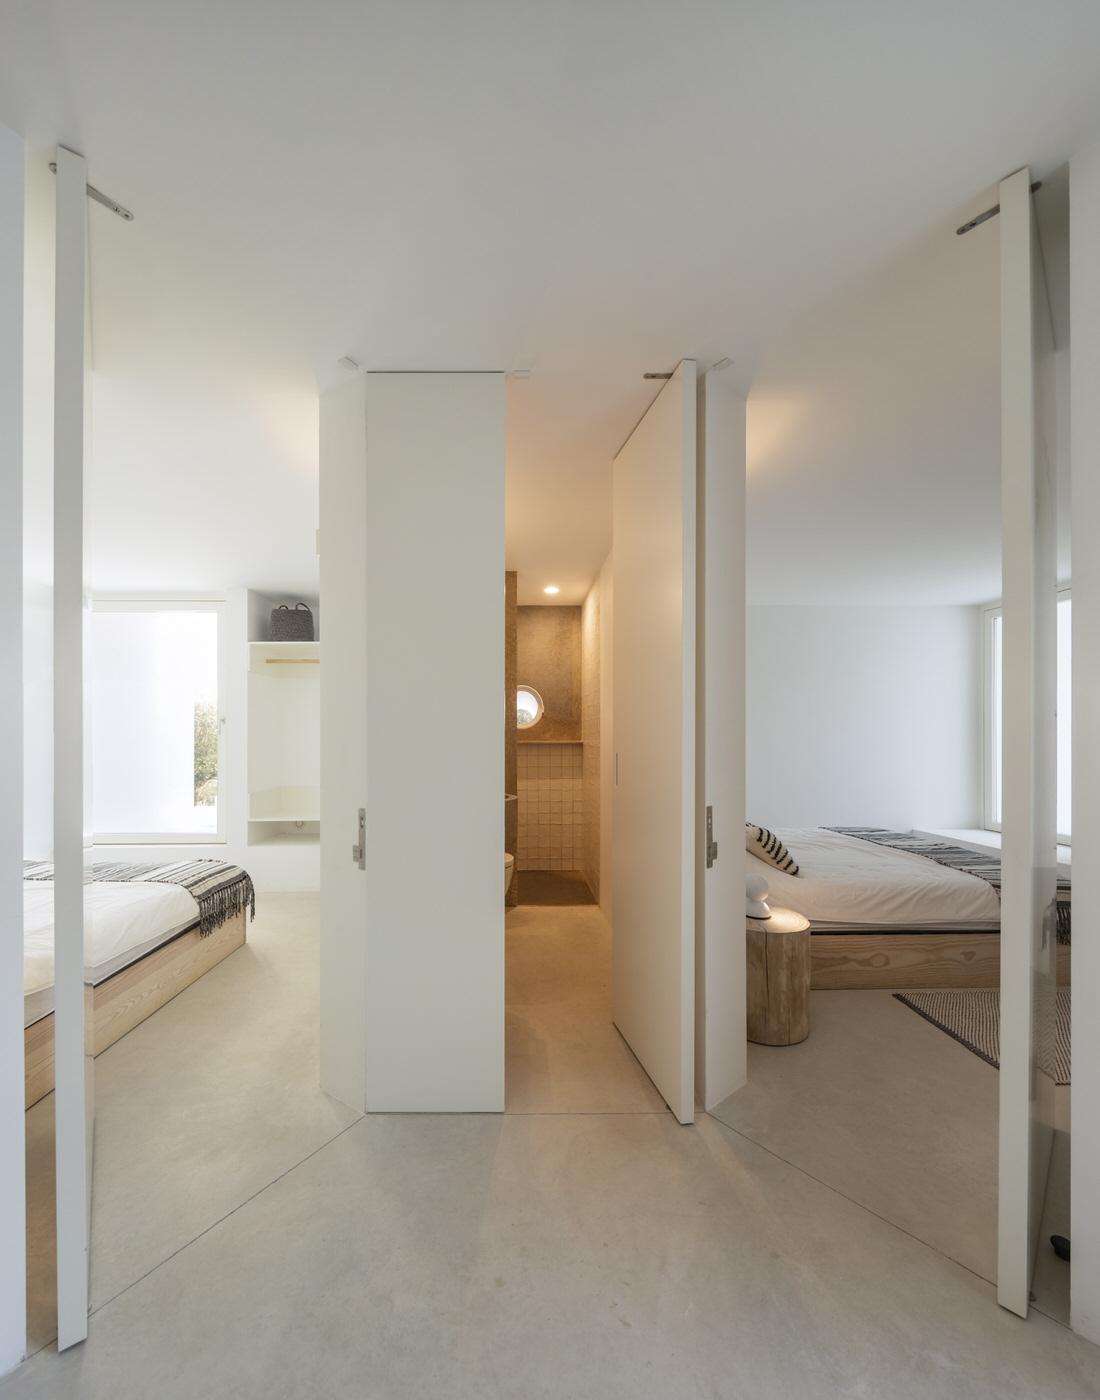 Zalig-Algarve-Casa-Luum-134-1_1